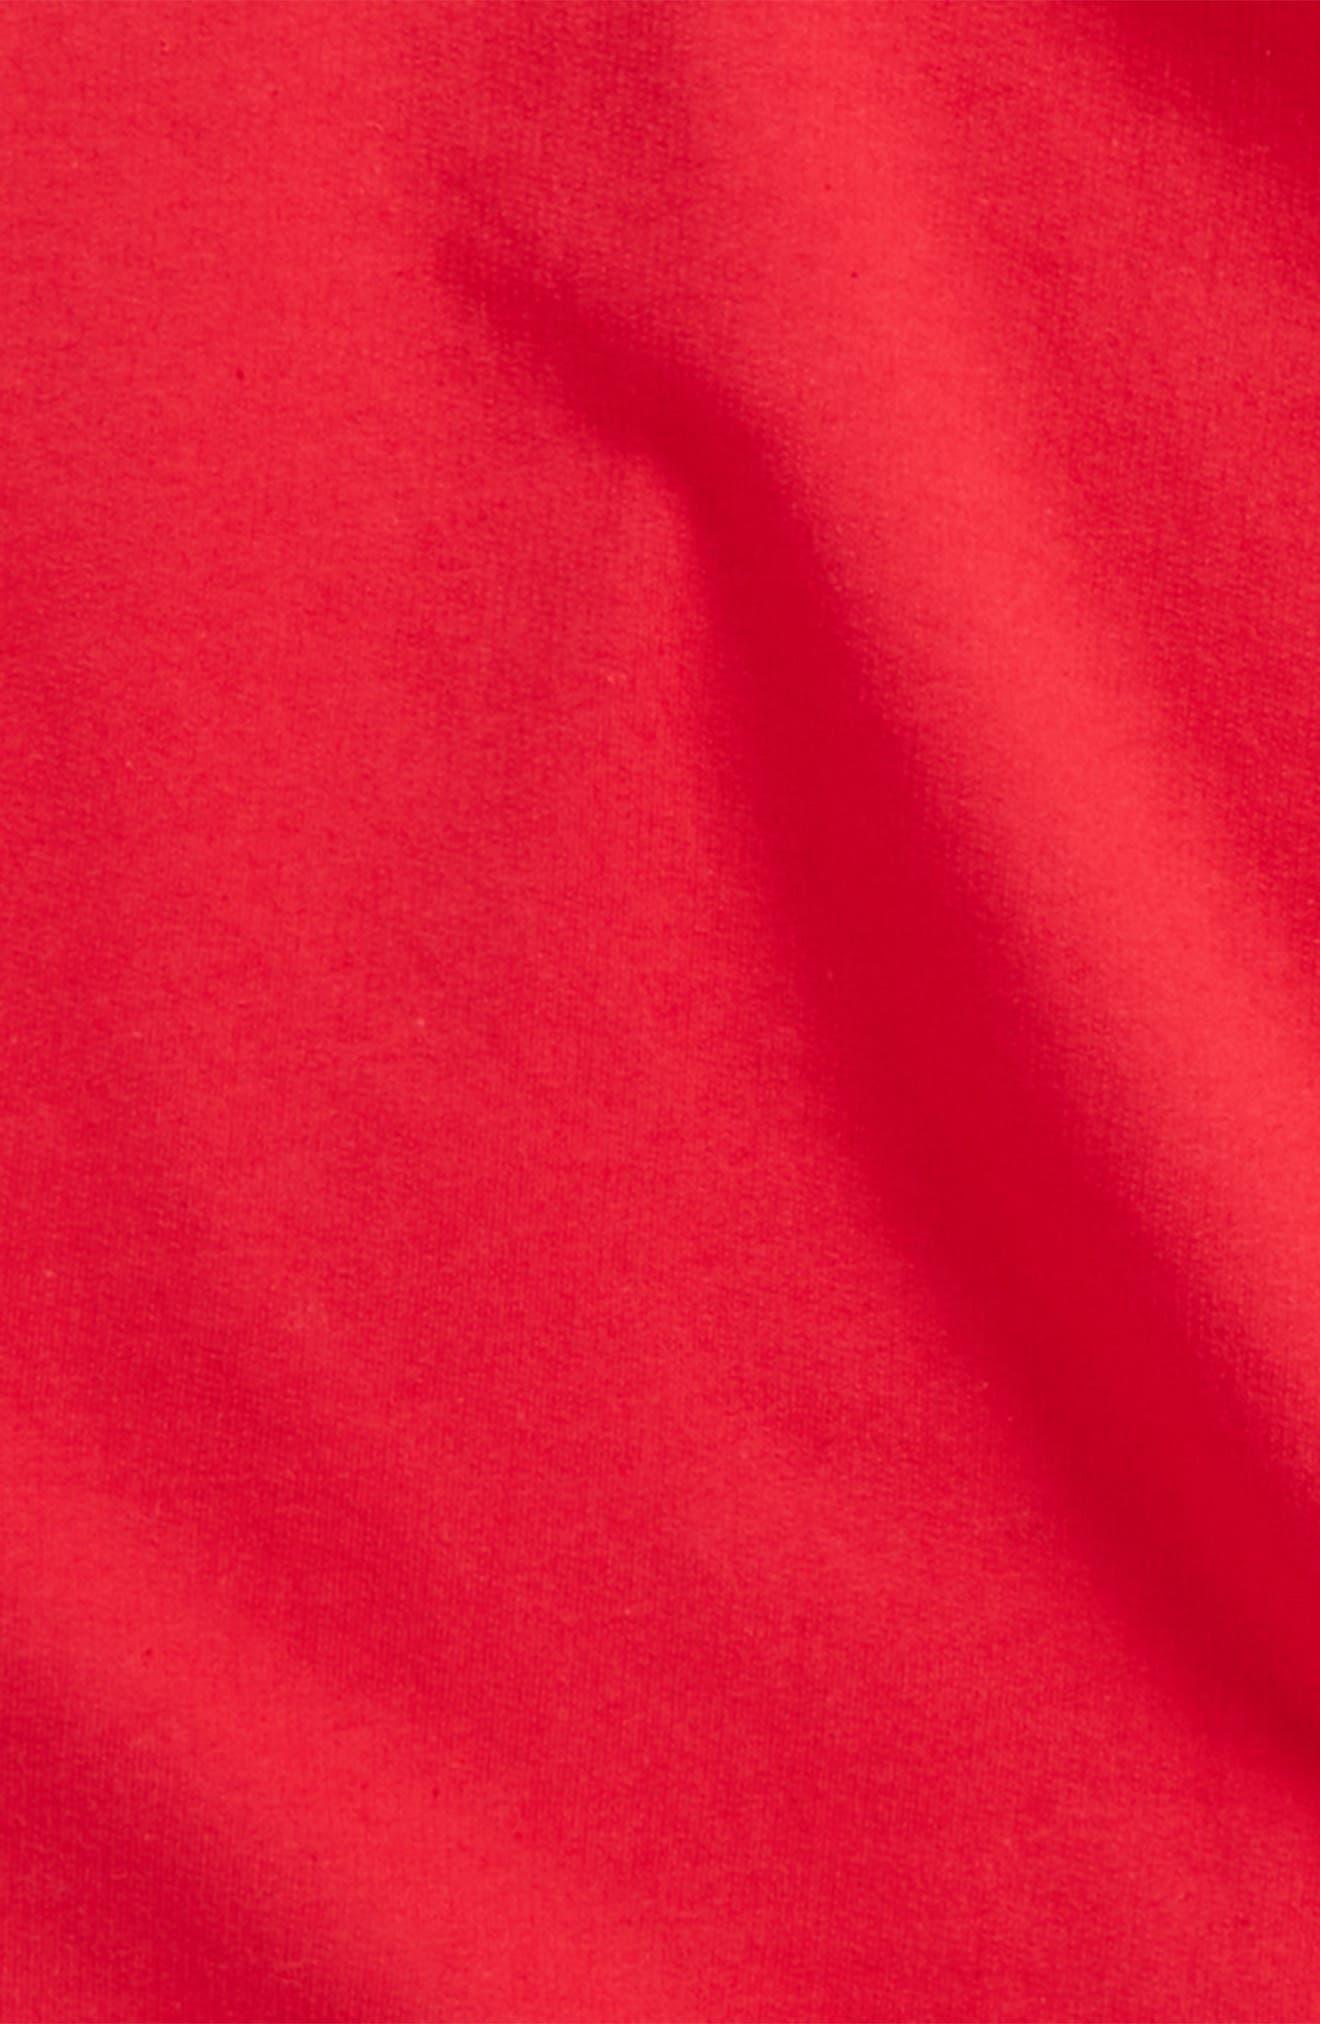 Stripe Trim Sweatshirt,                             Alternate thumbnail 2, color,                             Red